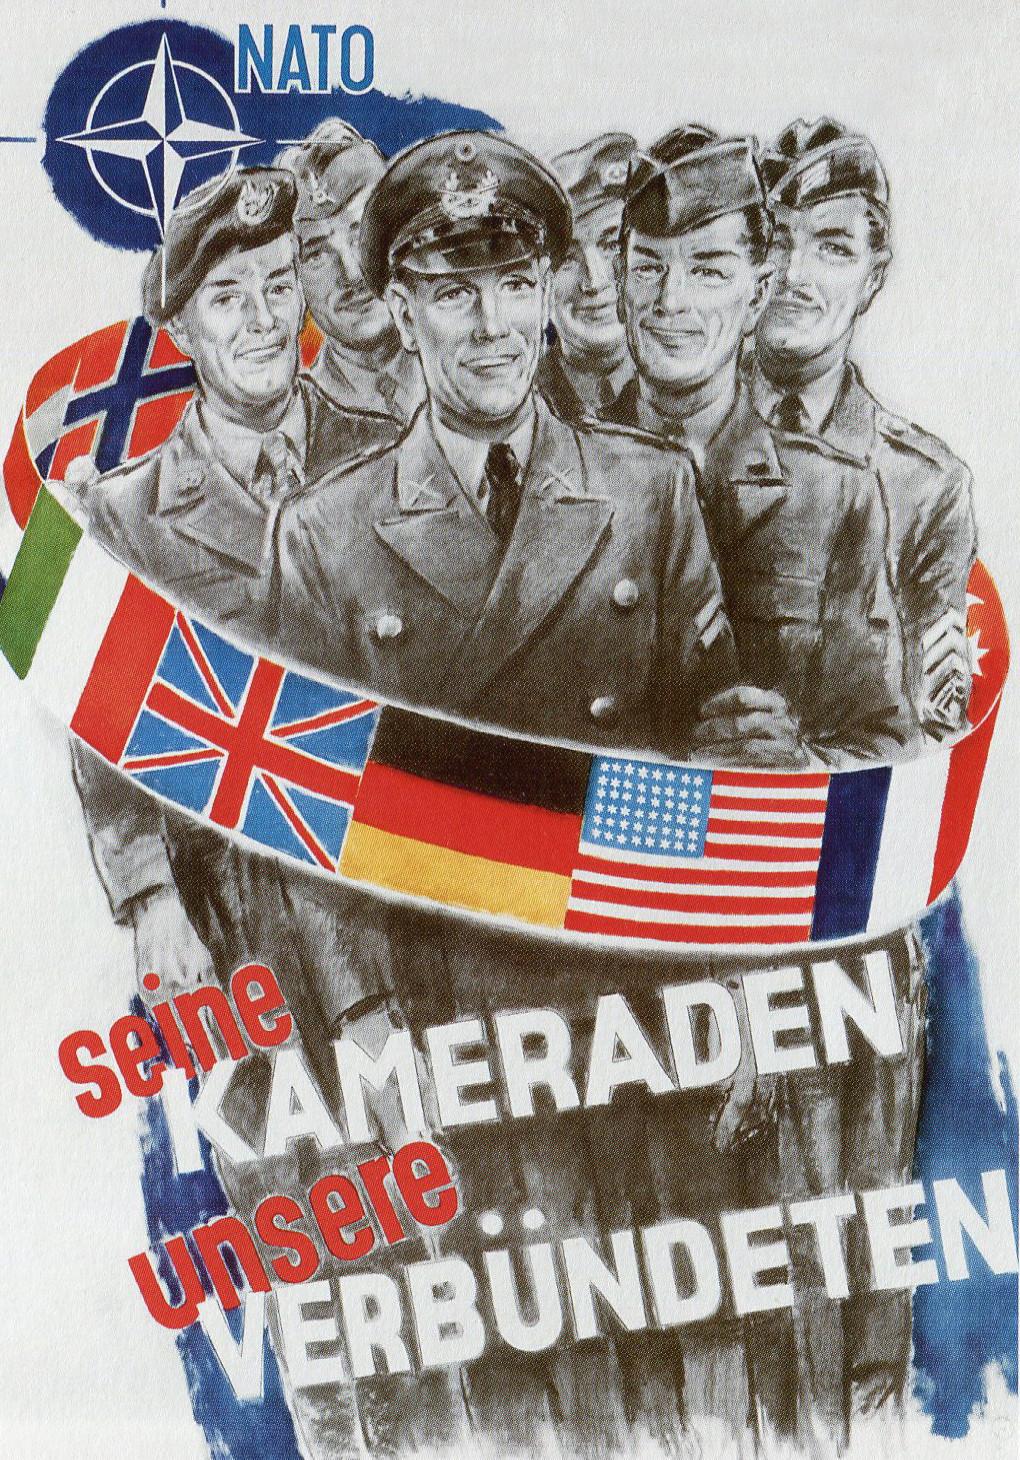 Army propaganda to join the nato